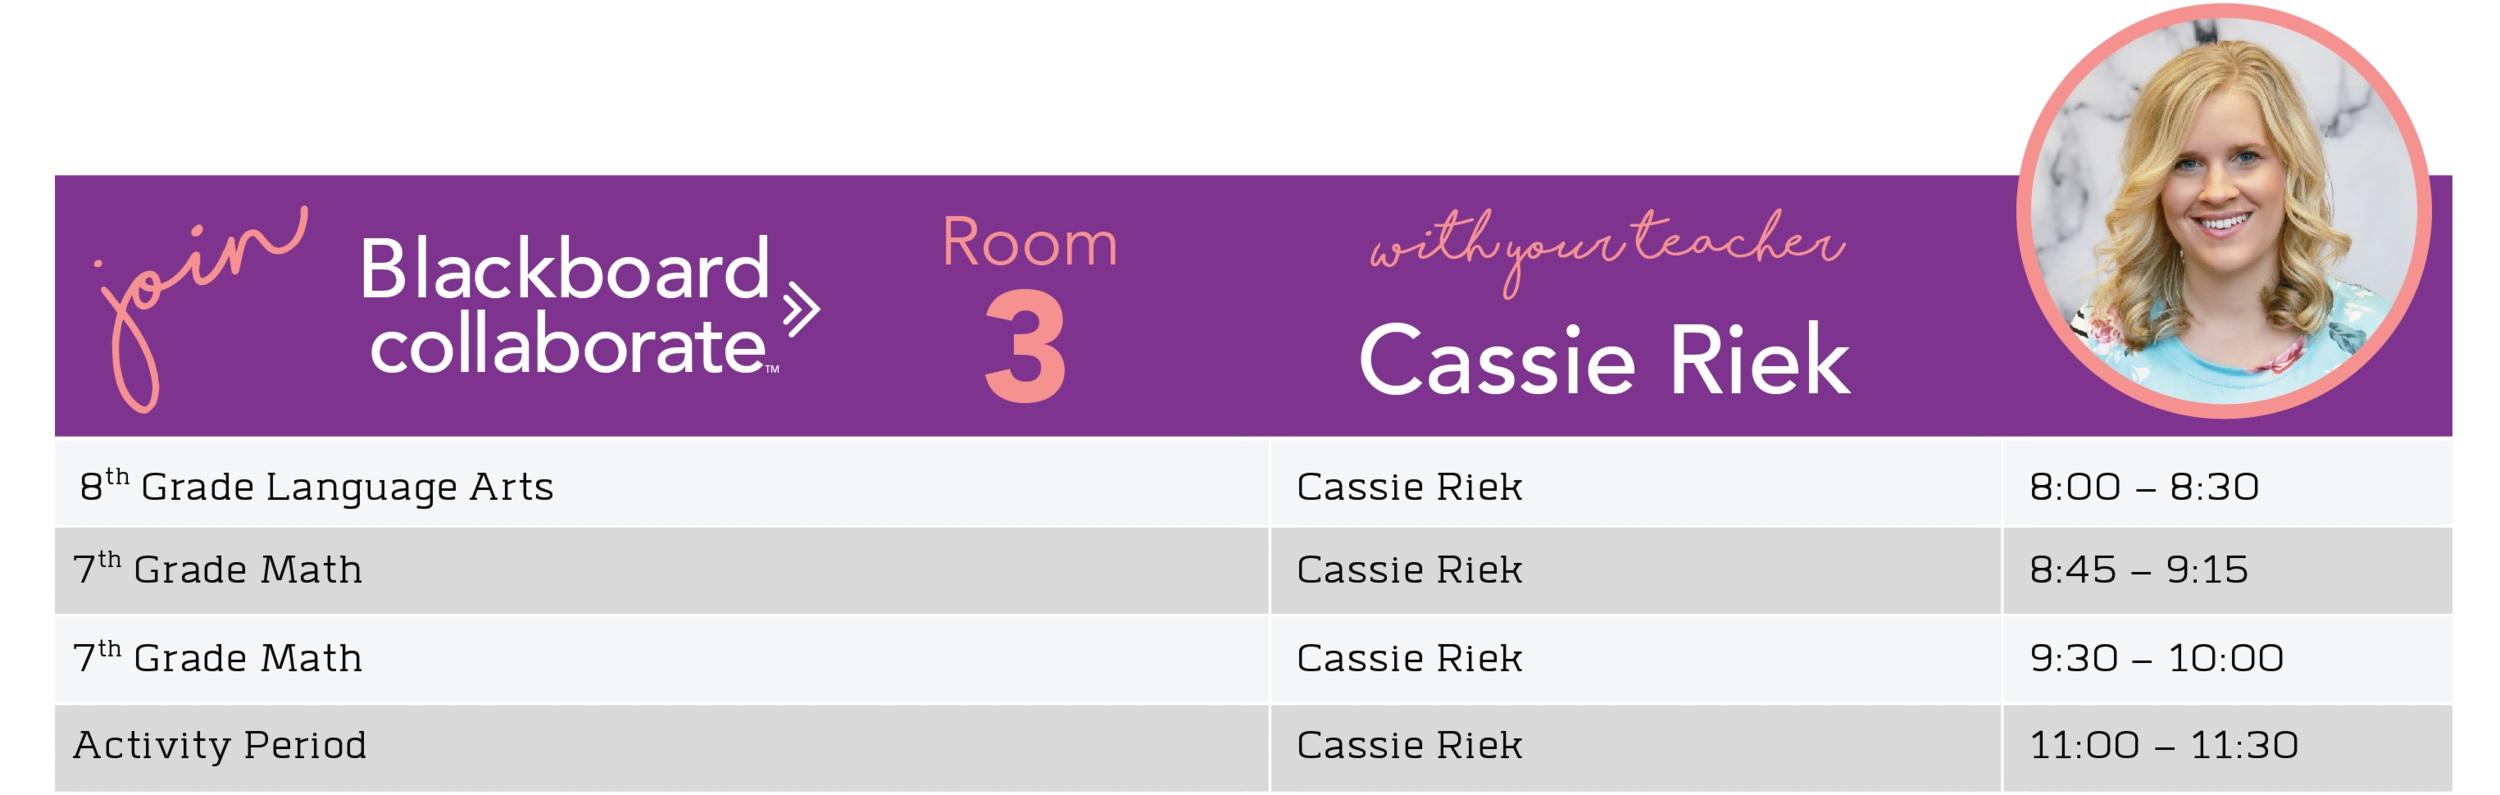 Cassie+Riek+Room+3